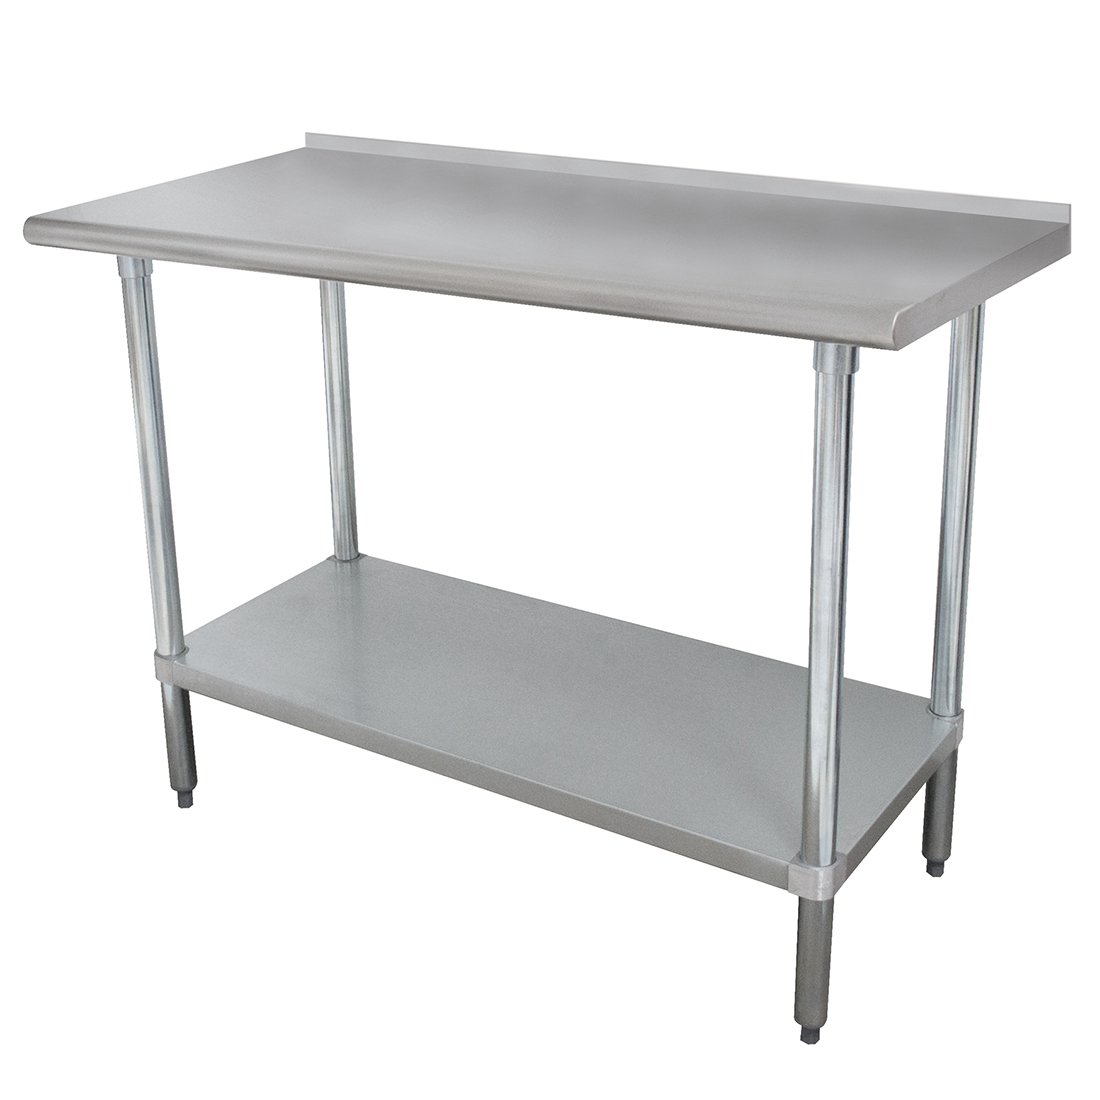 Advance Tabco FLG-302 work table,  24